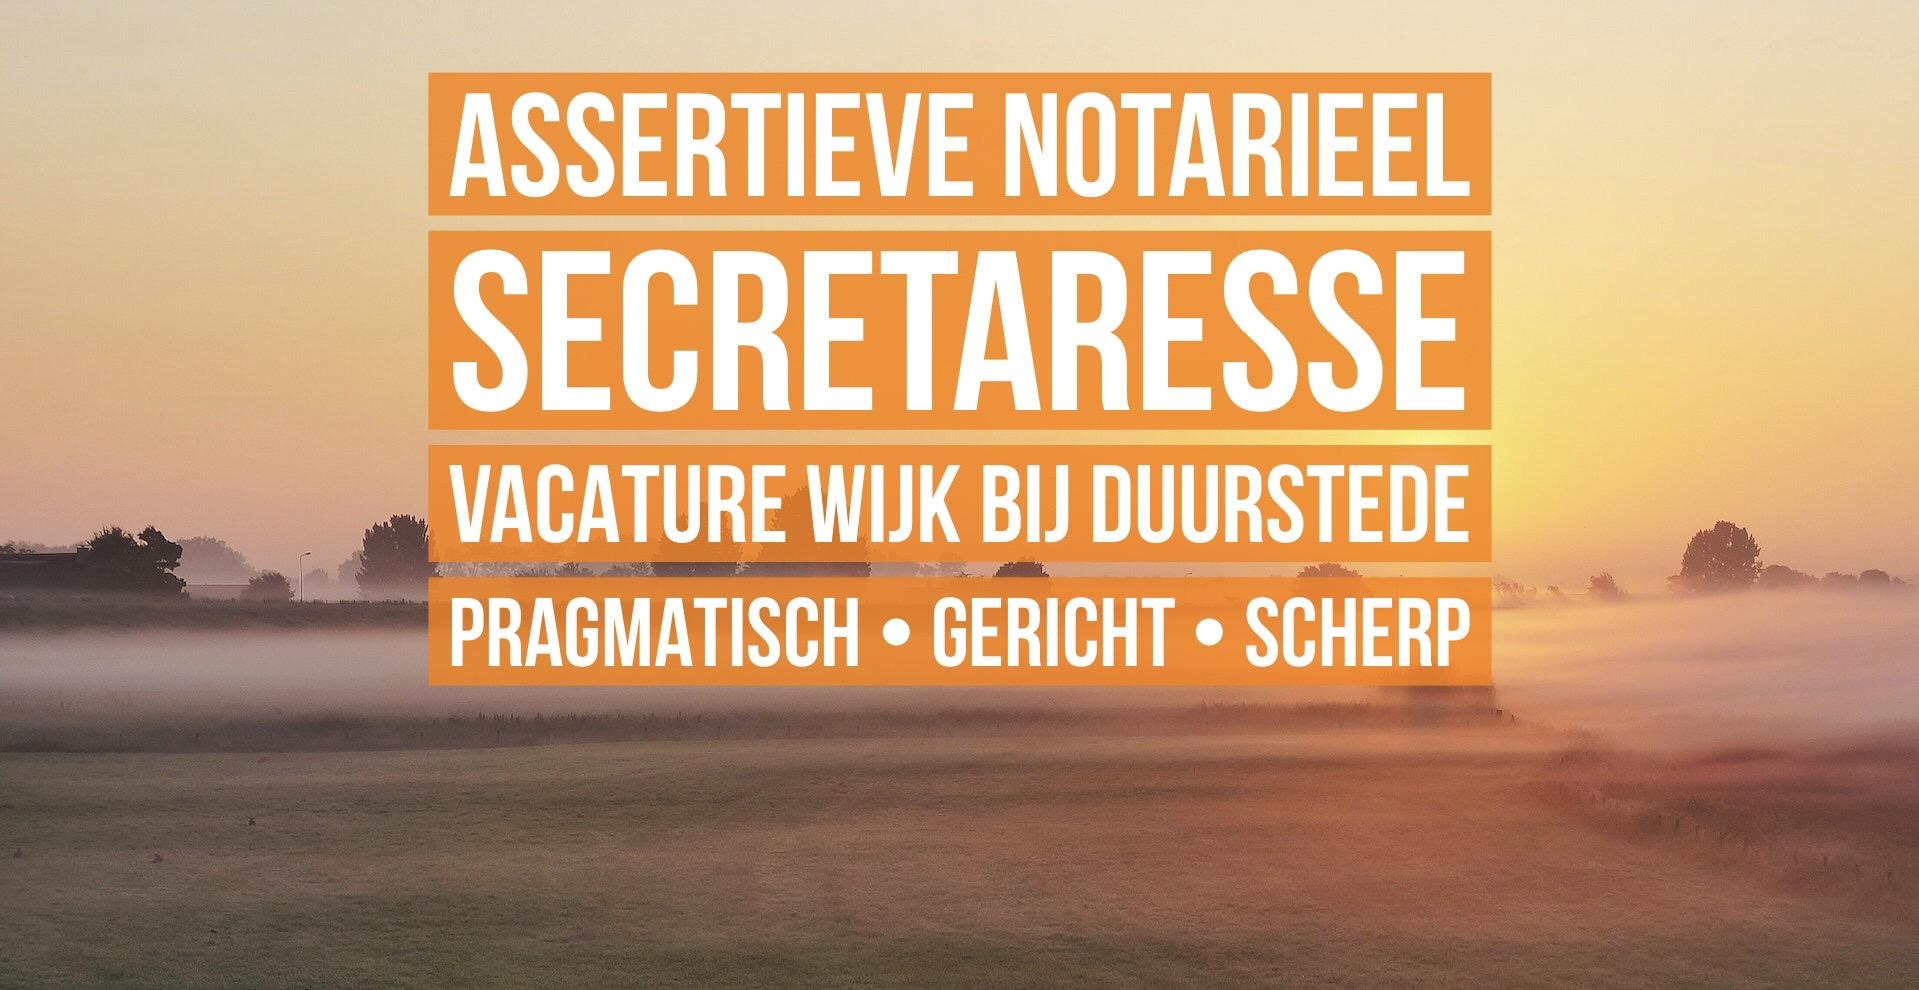 assertieve notarieel secretaresse vacature wijk bij duurstede pragmatisch gericht scherp